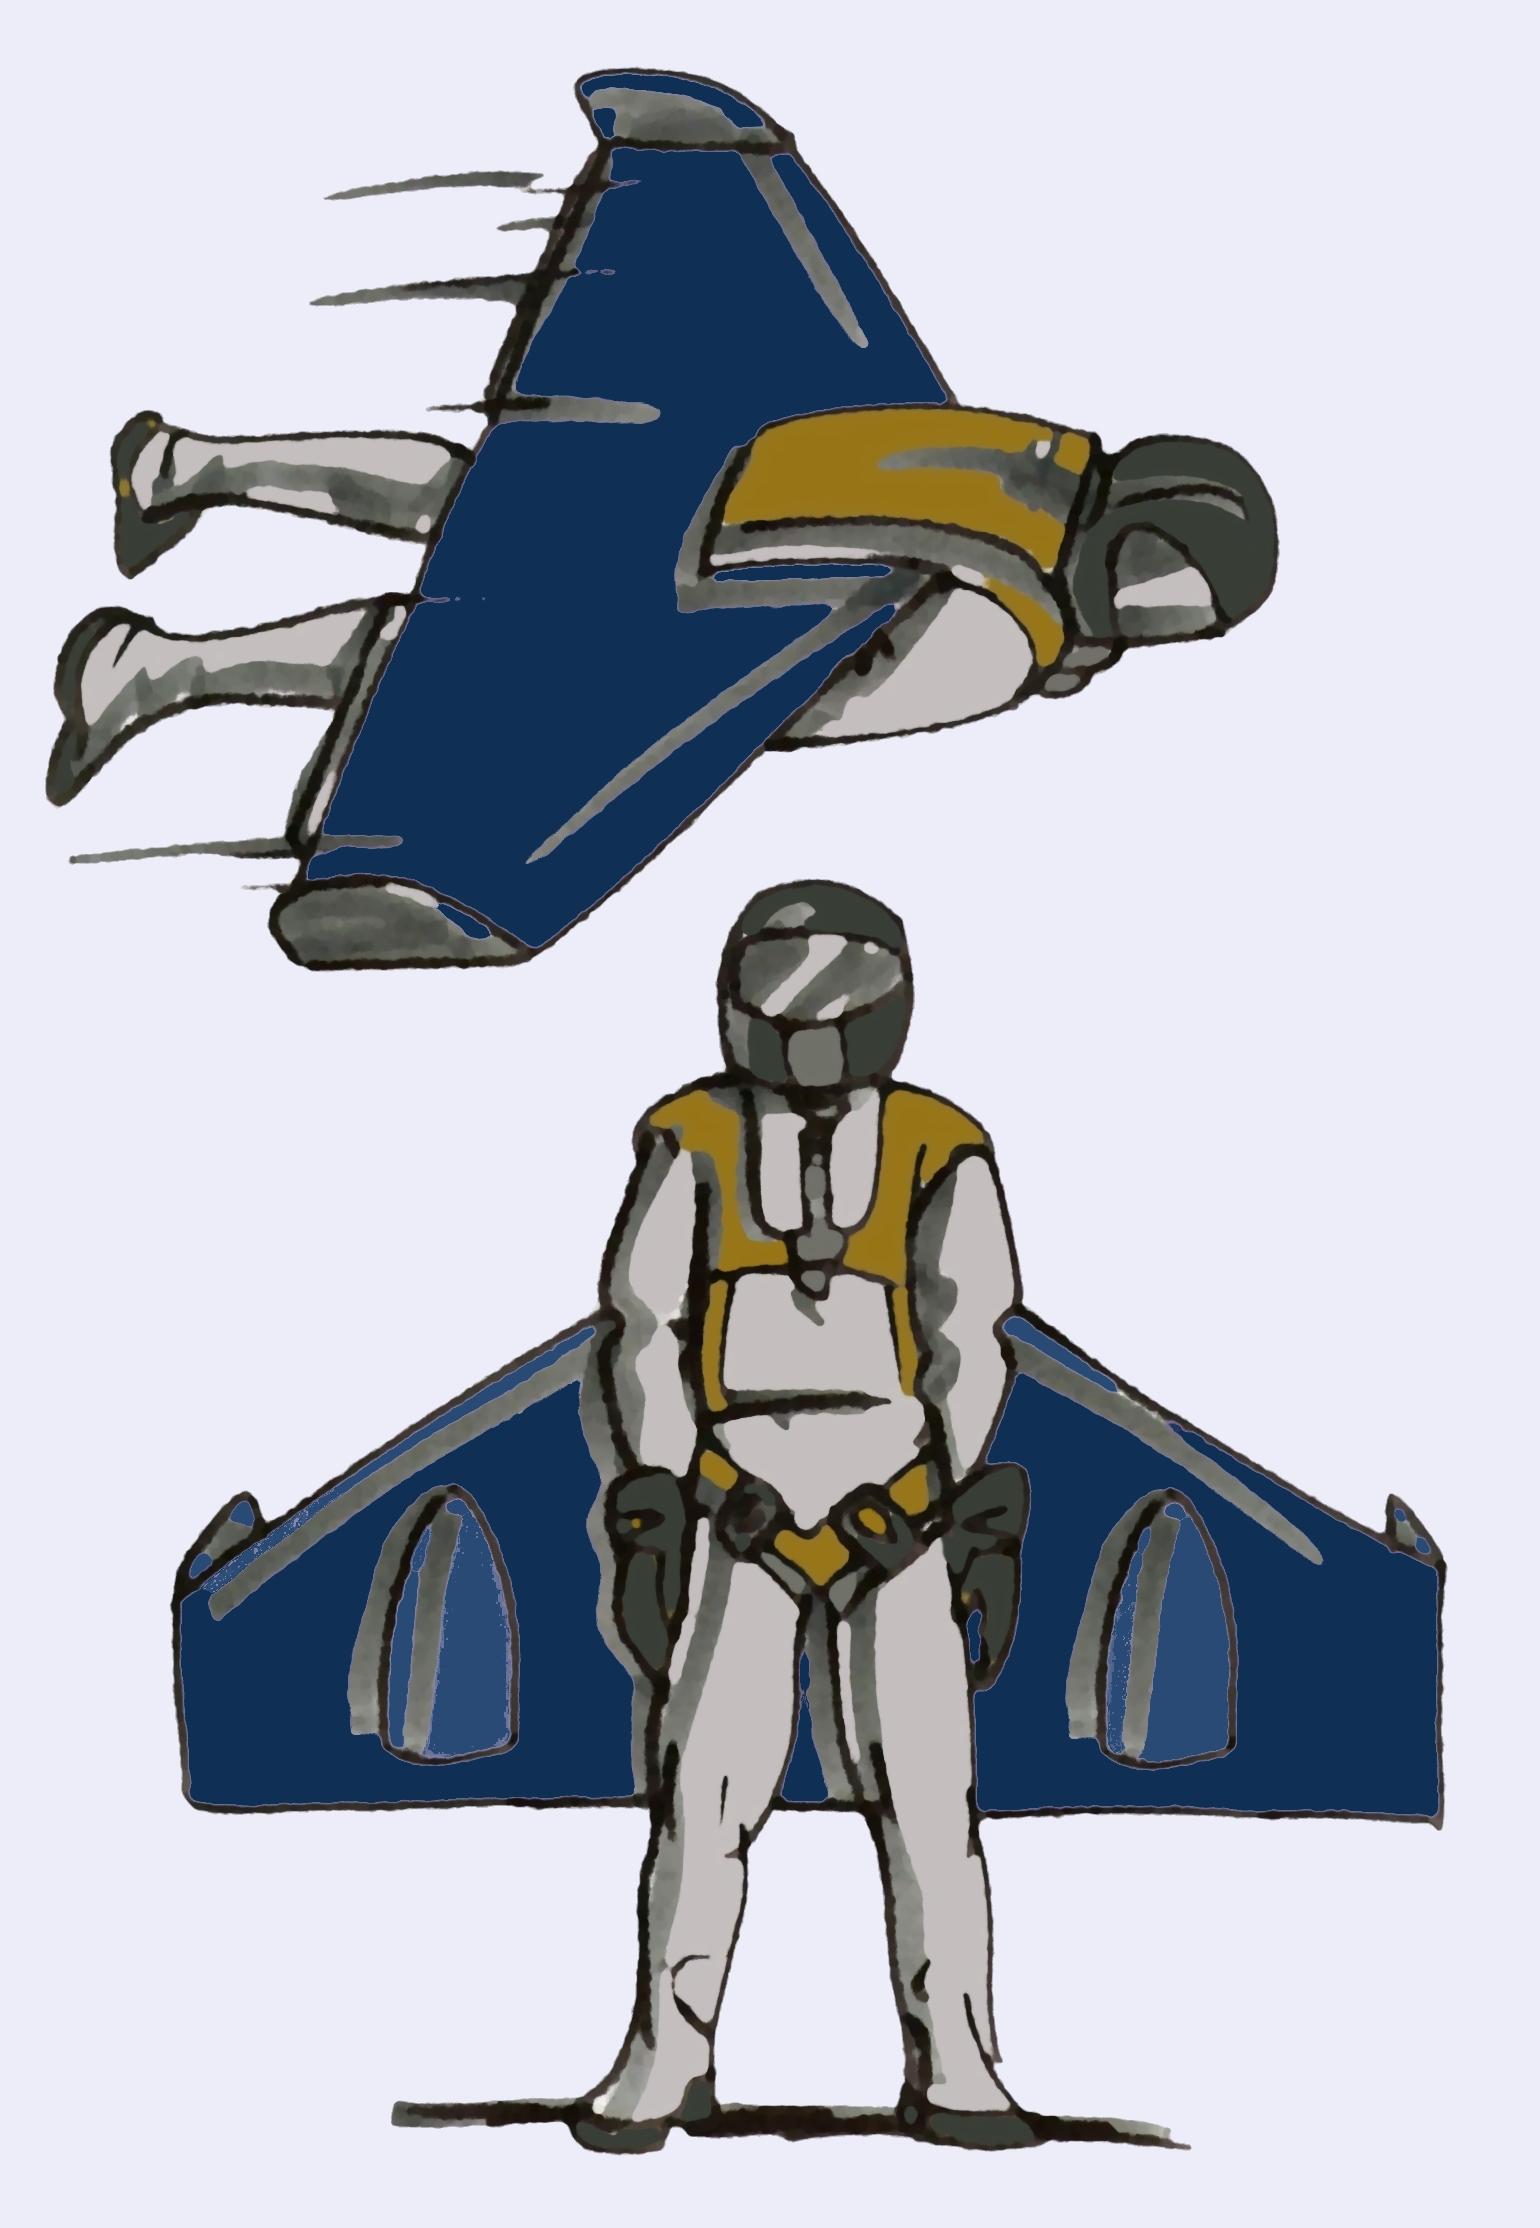 http://upload.wikimedia.org/wikipedia/commons/c/c2/Wingpack.jpeg